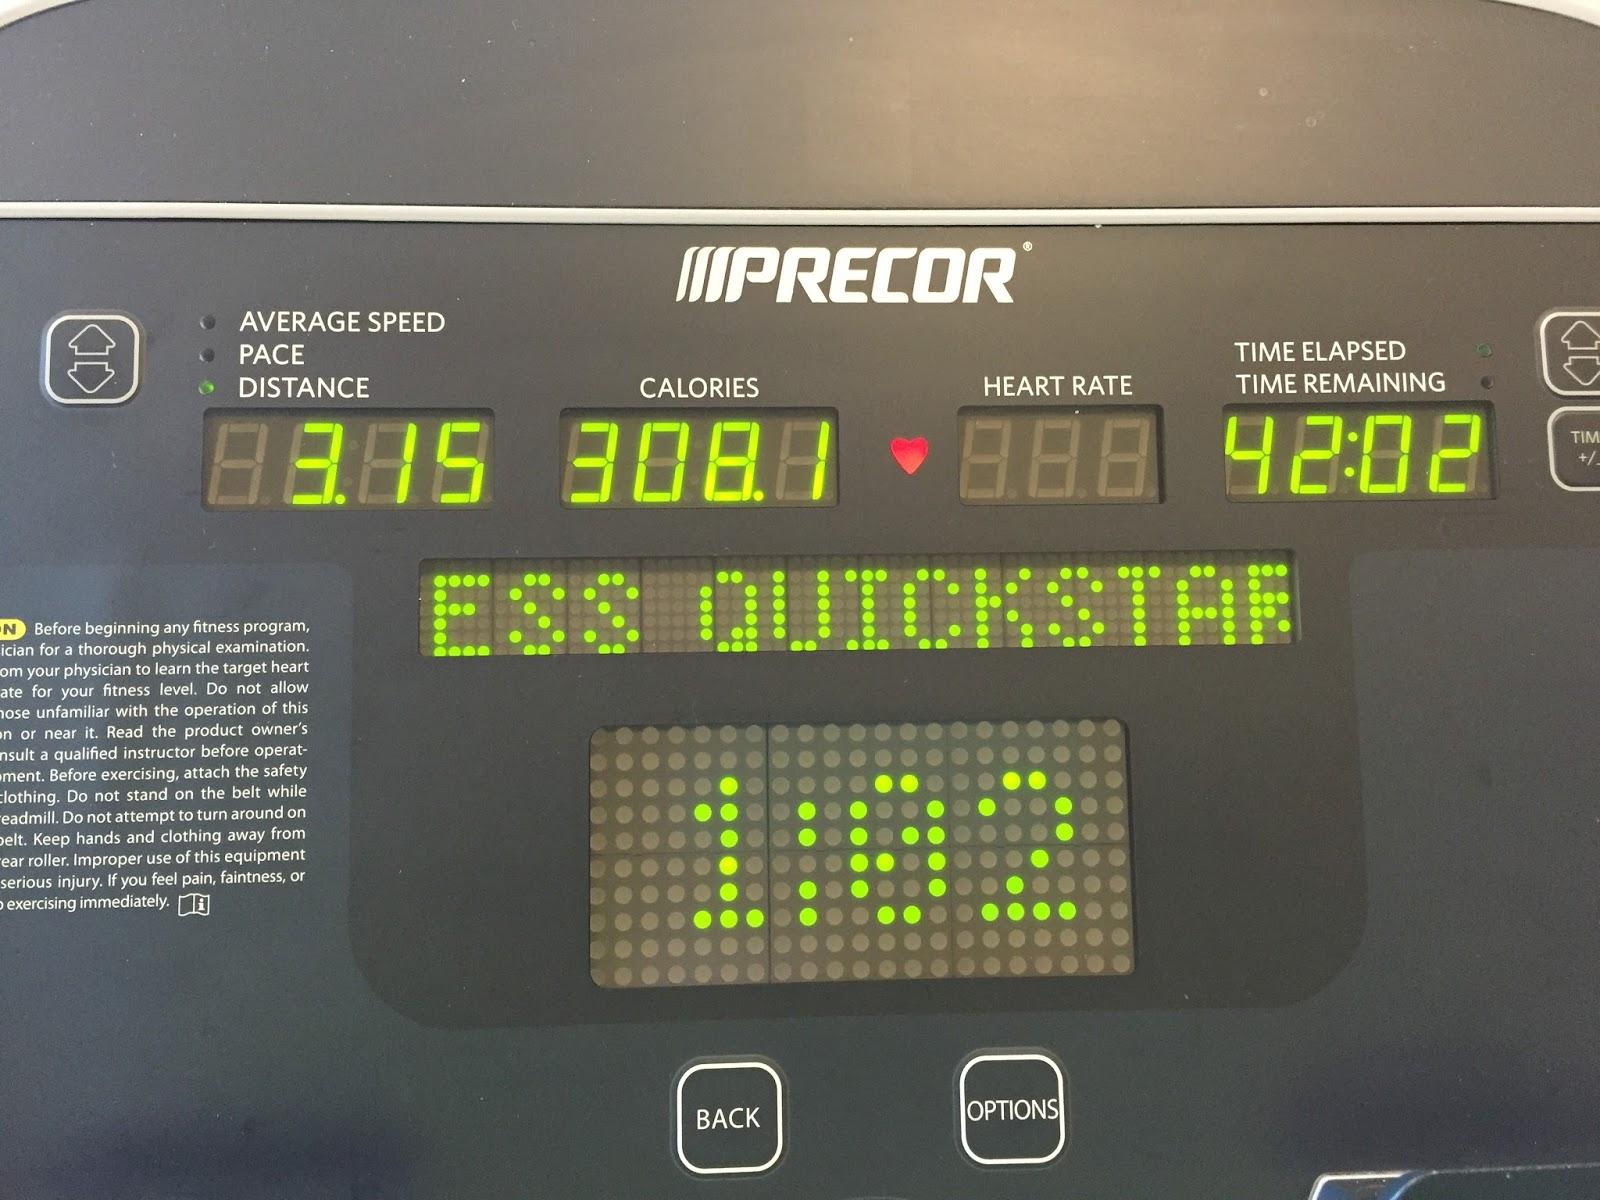 3.15 miles on the treadmill